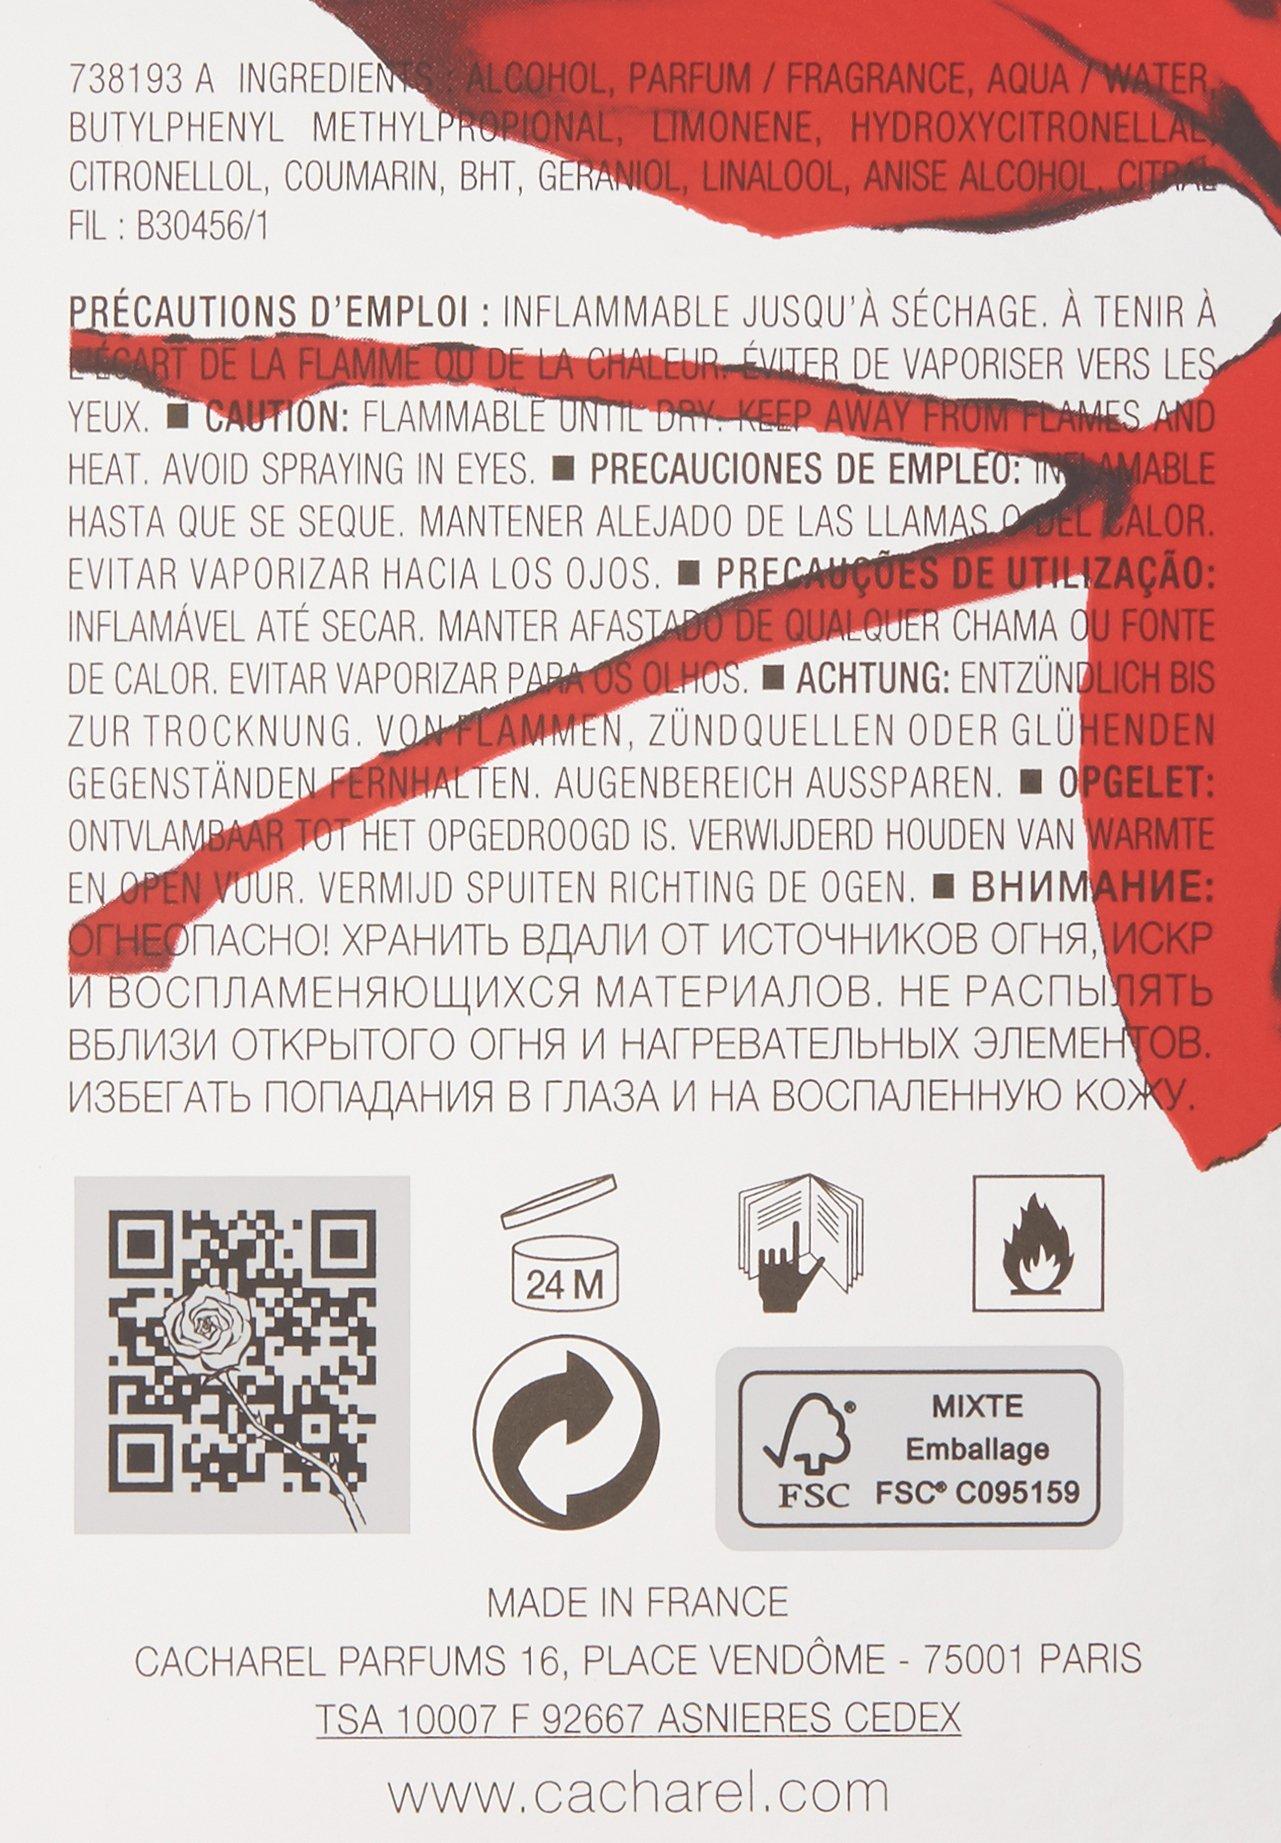 Cacharel Amor Amor Eau de Toilette Spray, 3.4 Fl Oz by Cacharel (Image #2)